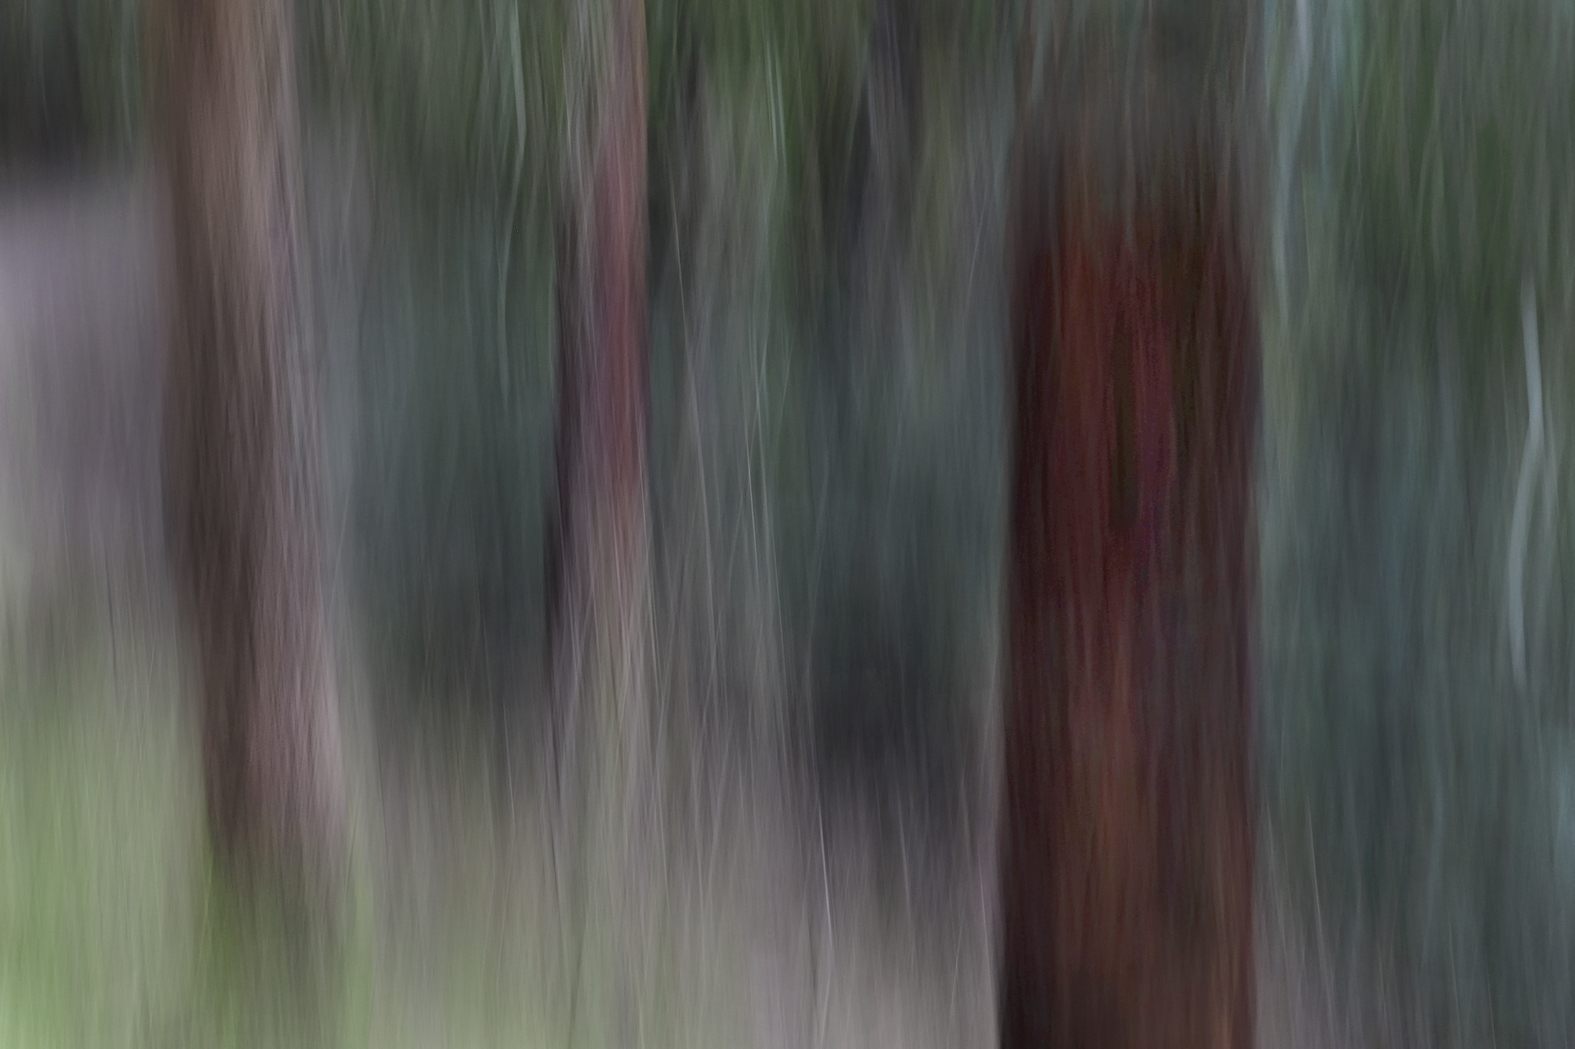 woodlands_#3.jpg